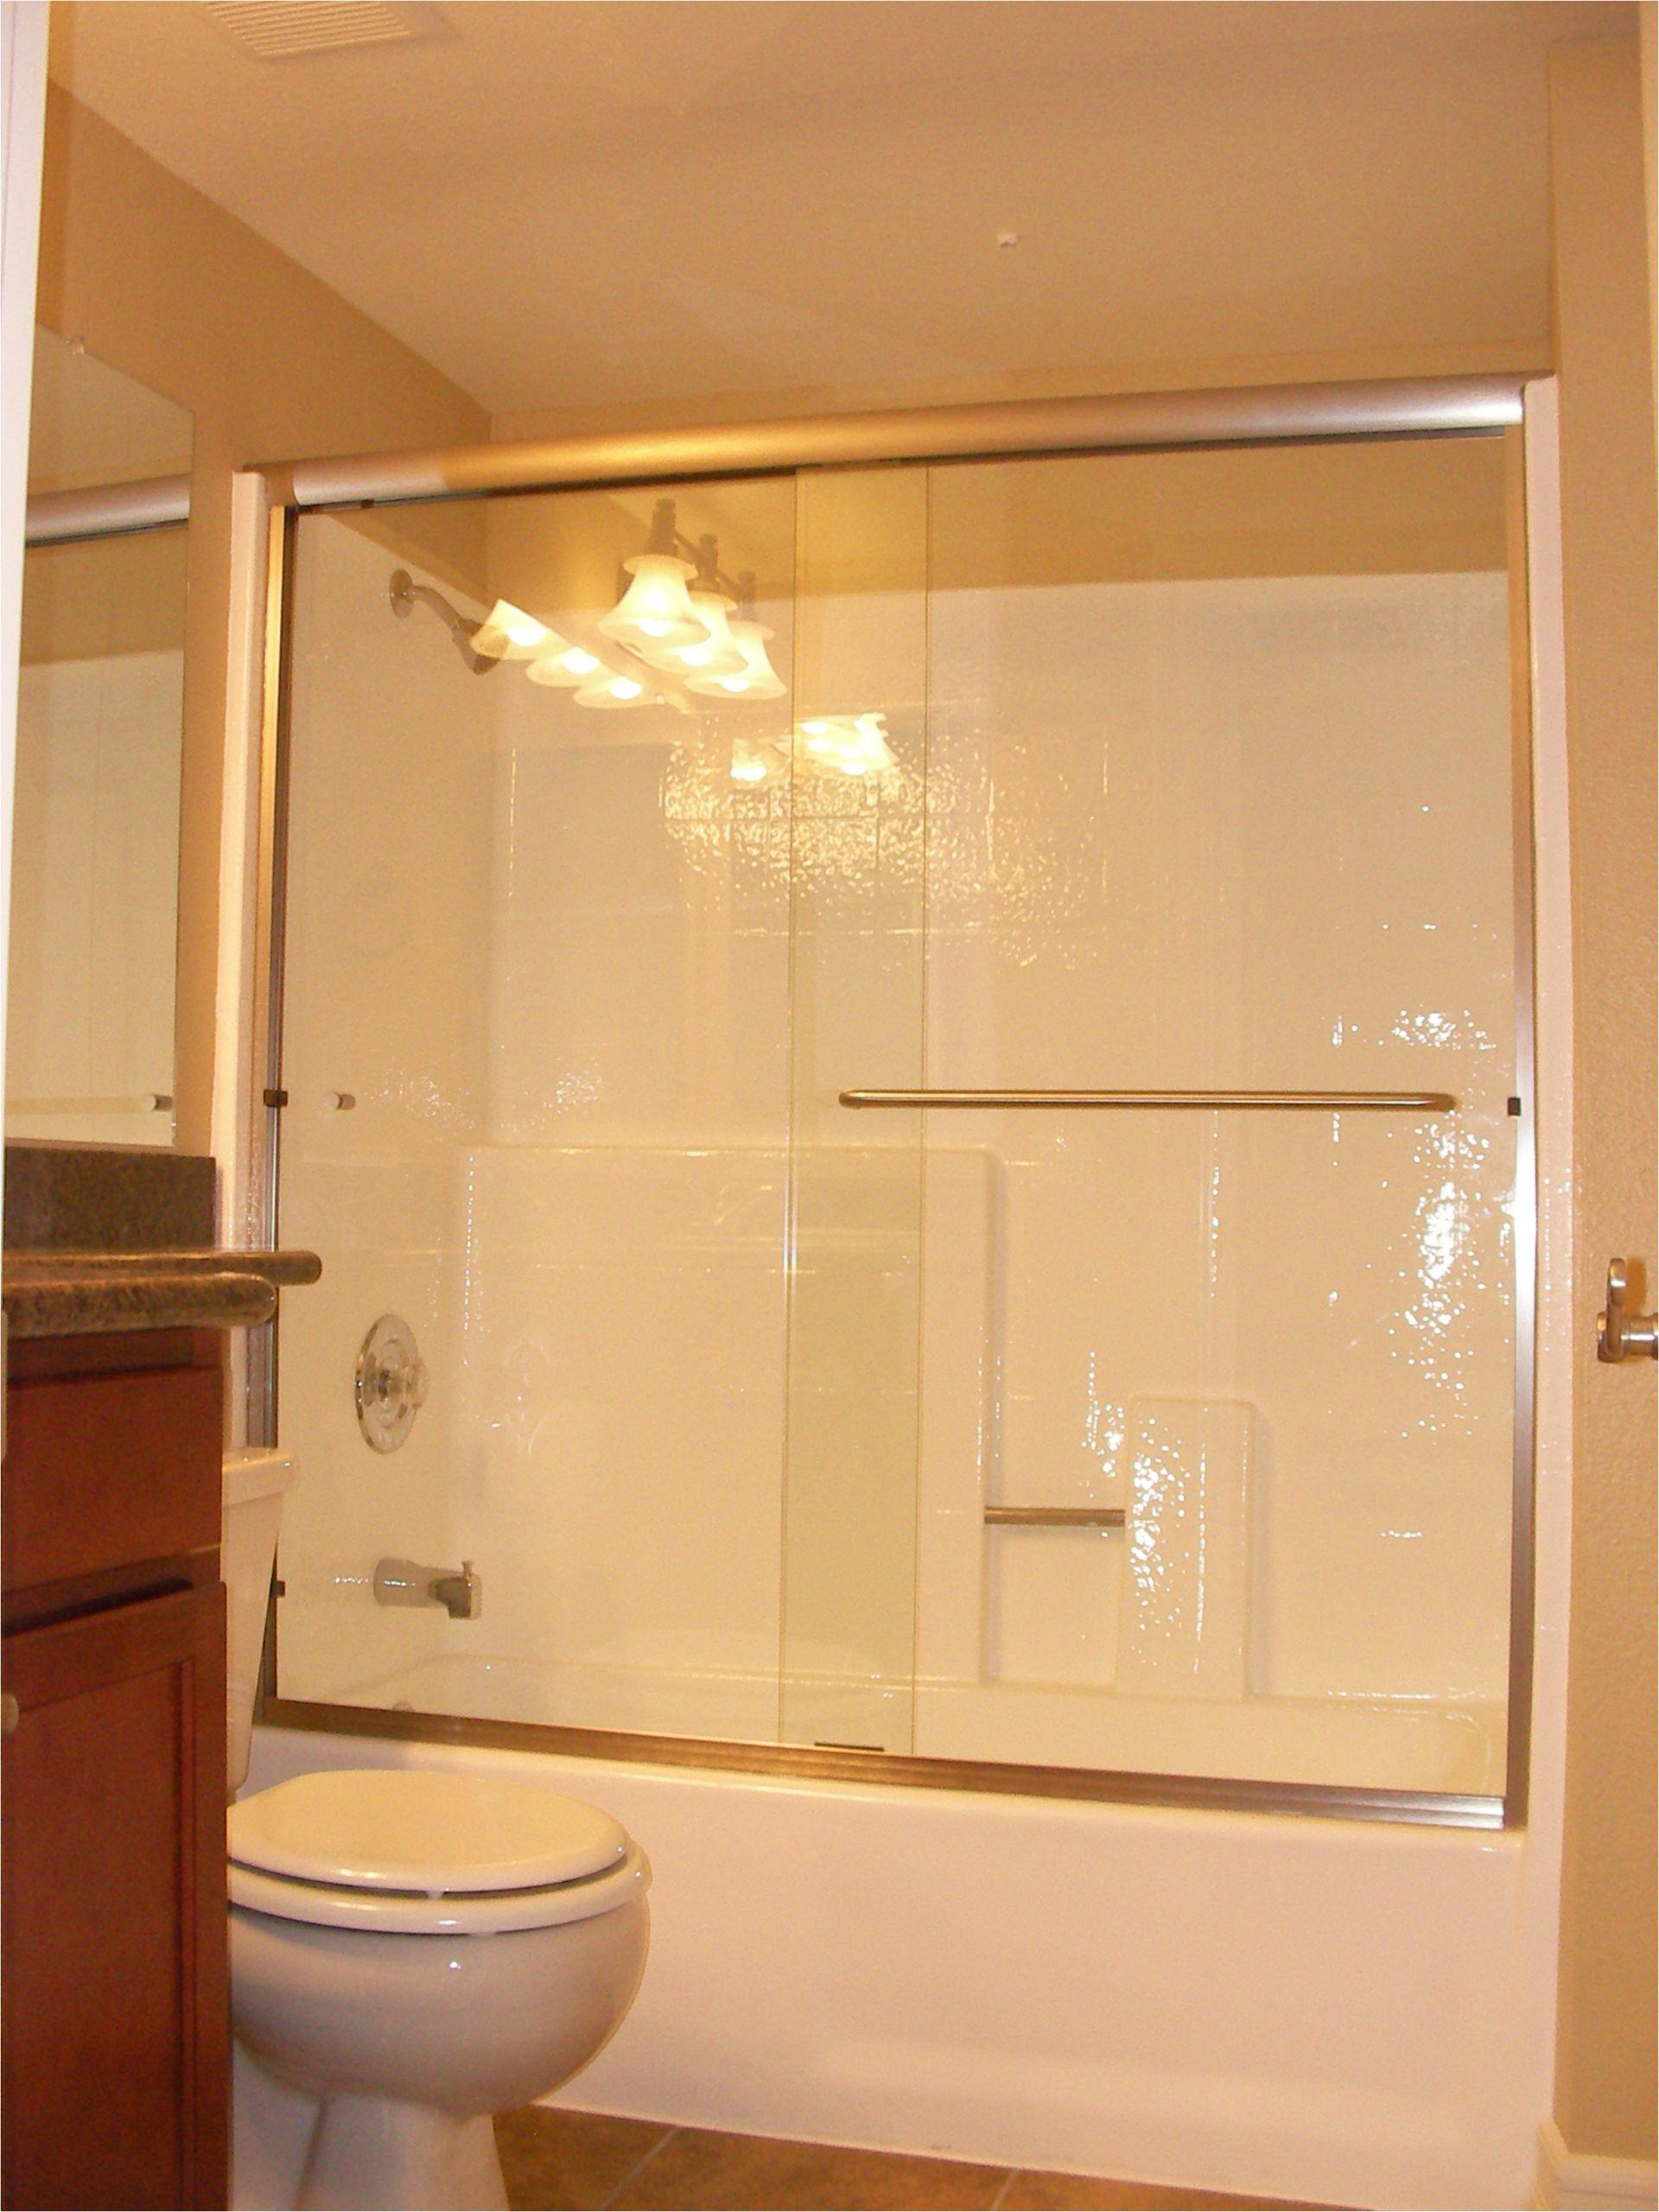 Bathtubs and Enclosures Shower Door Glass Best Choice